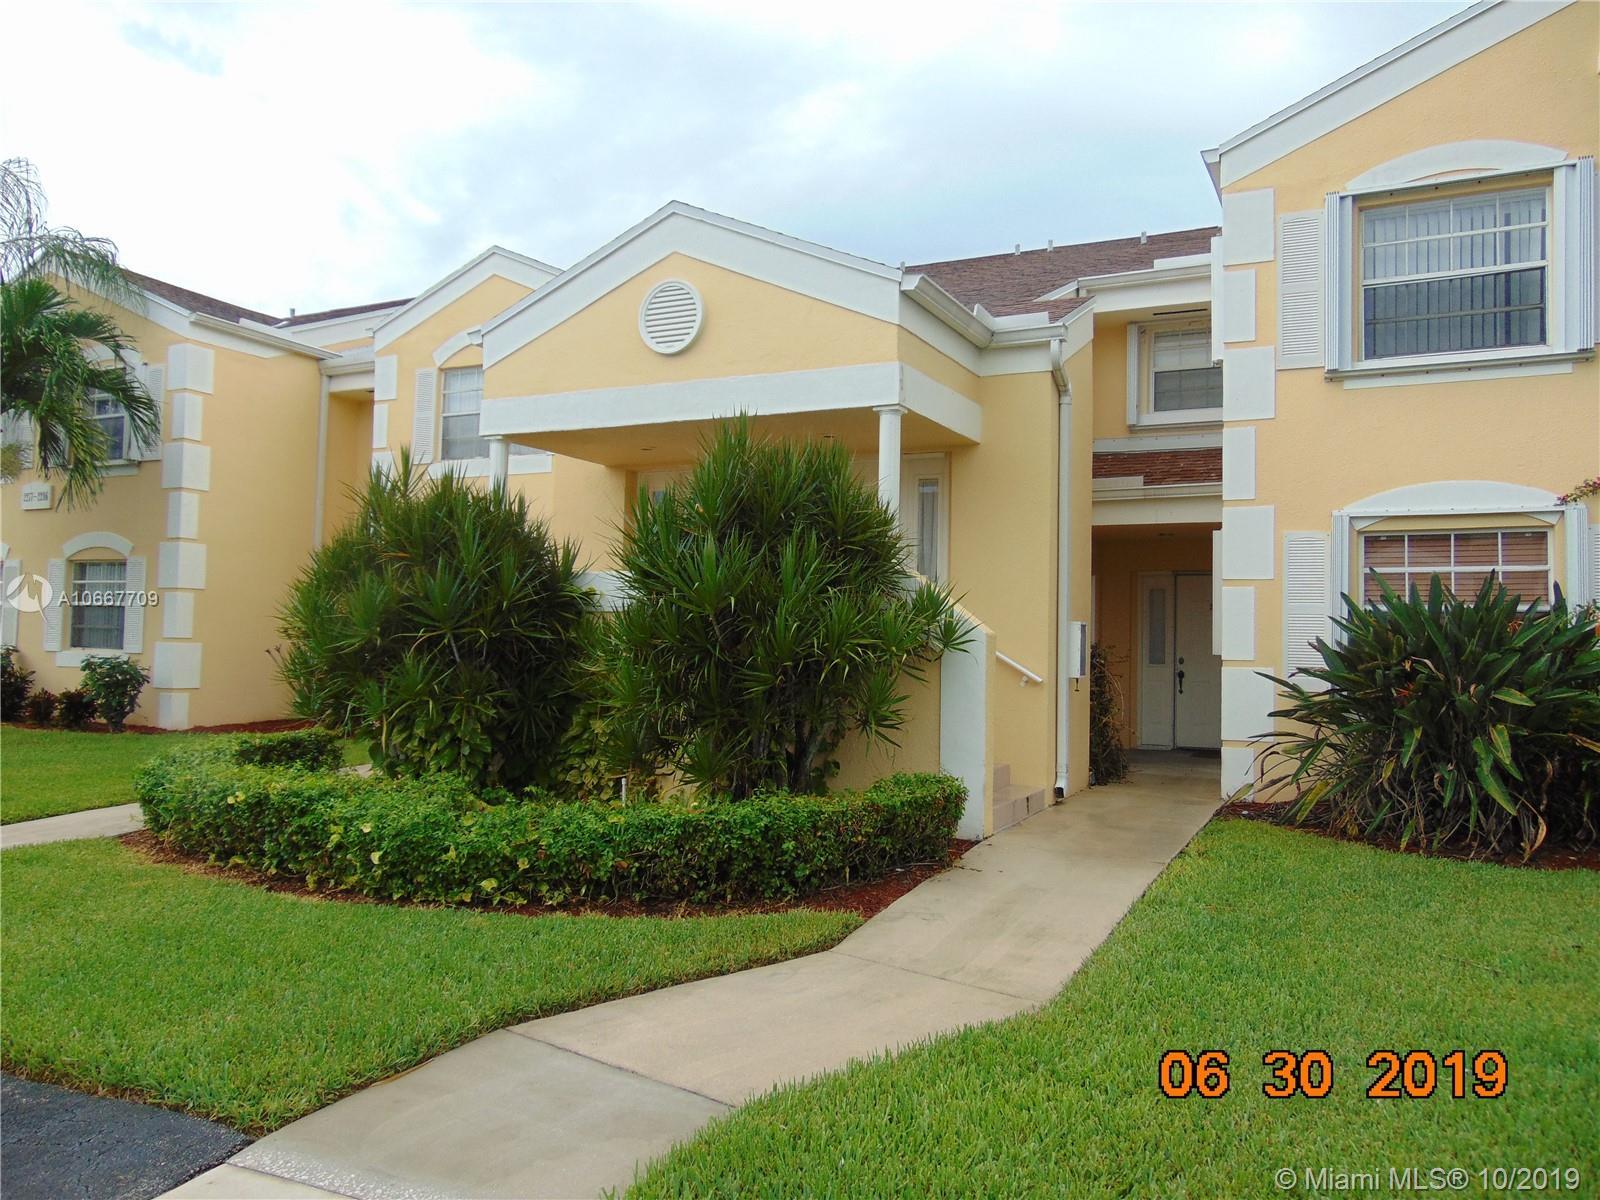 2284 27th Dr #204-G, Homestead, FL 33035 - Homestead, FL real estate listing